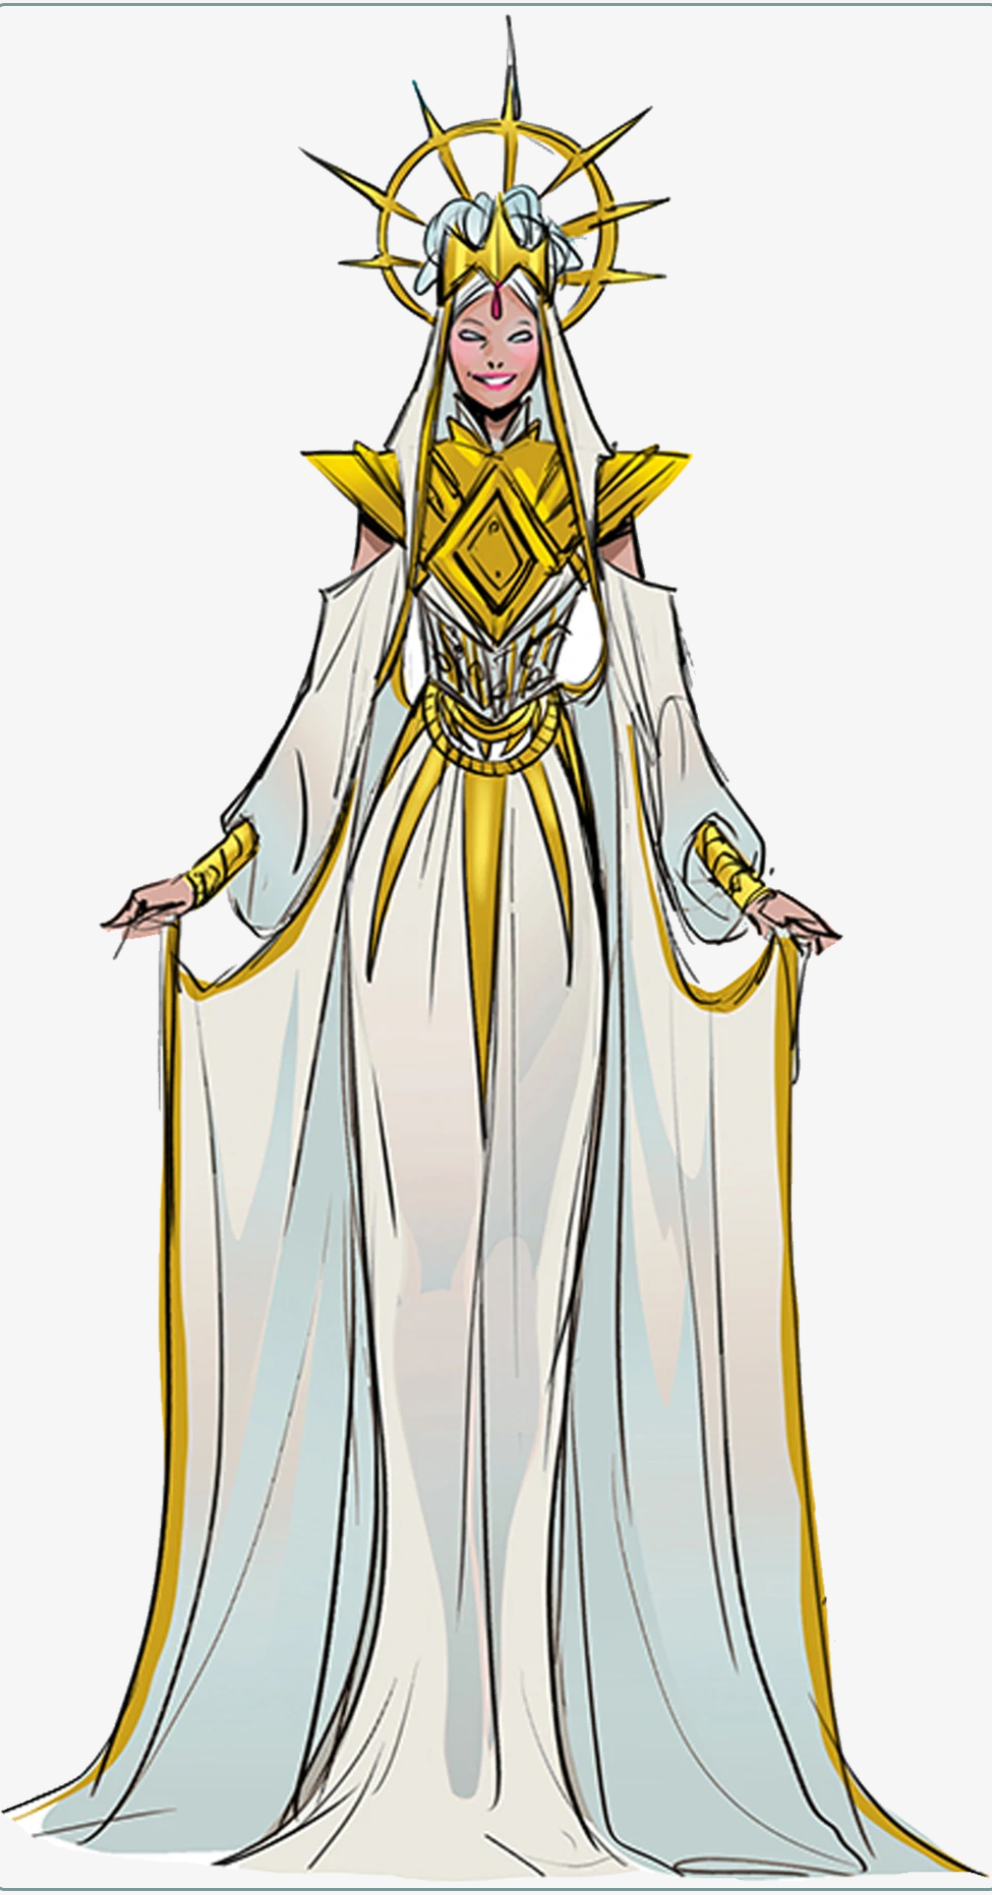 Lady Viena (Rita Repulsa mother)